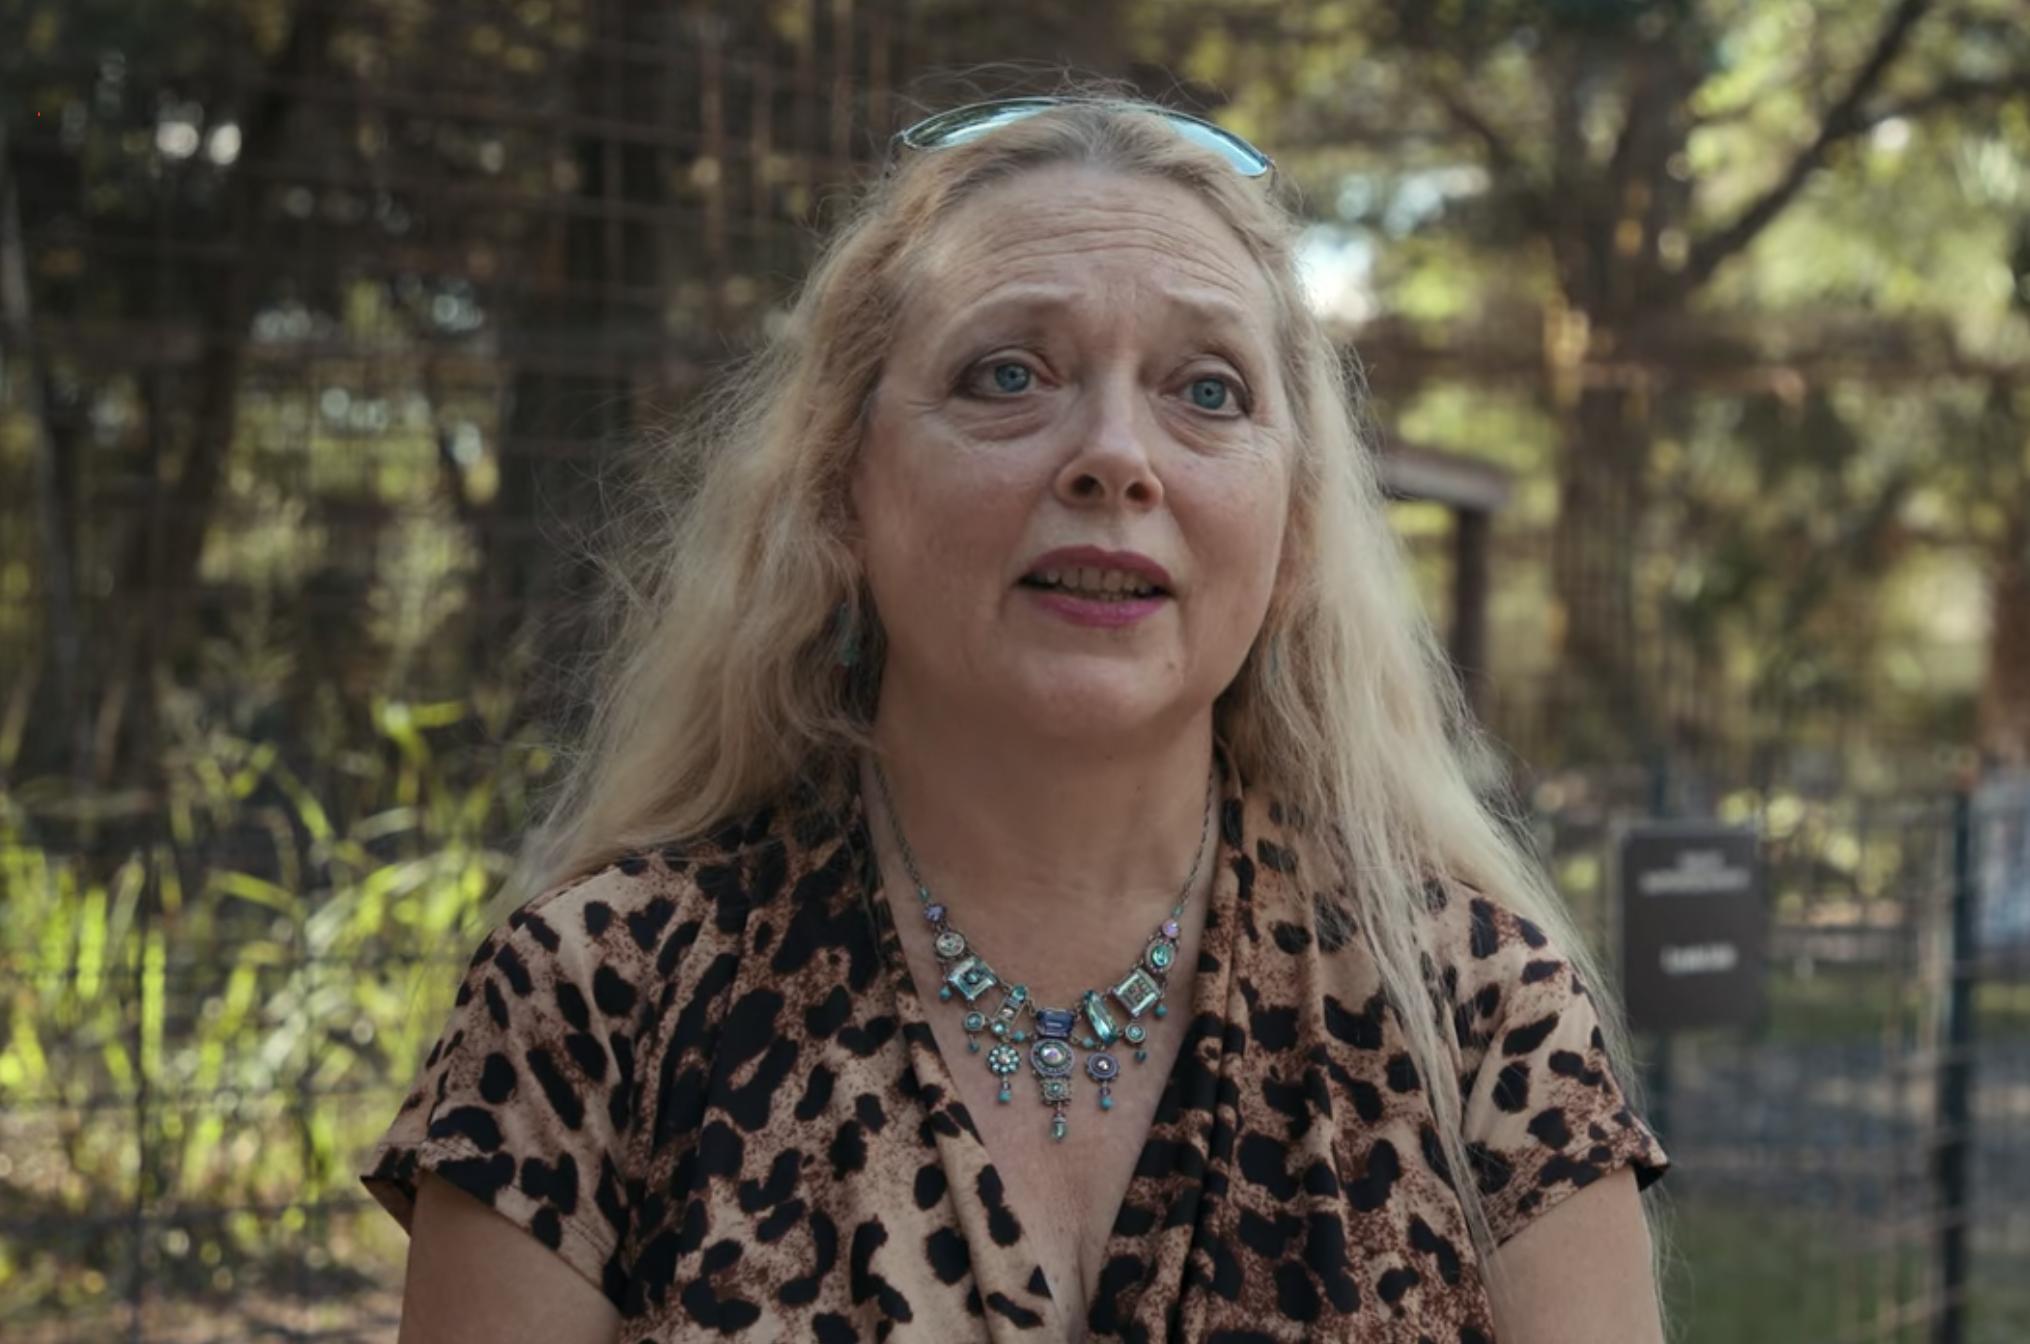 Carole talking in an animal print shirt